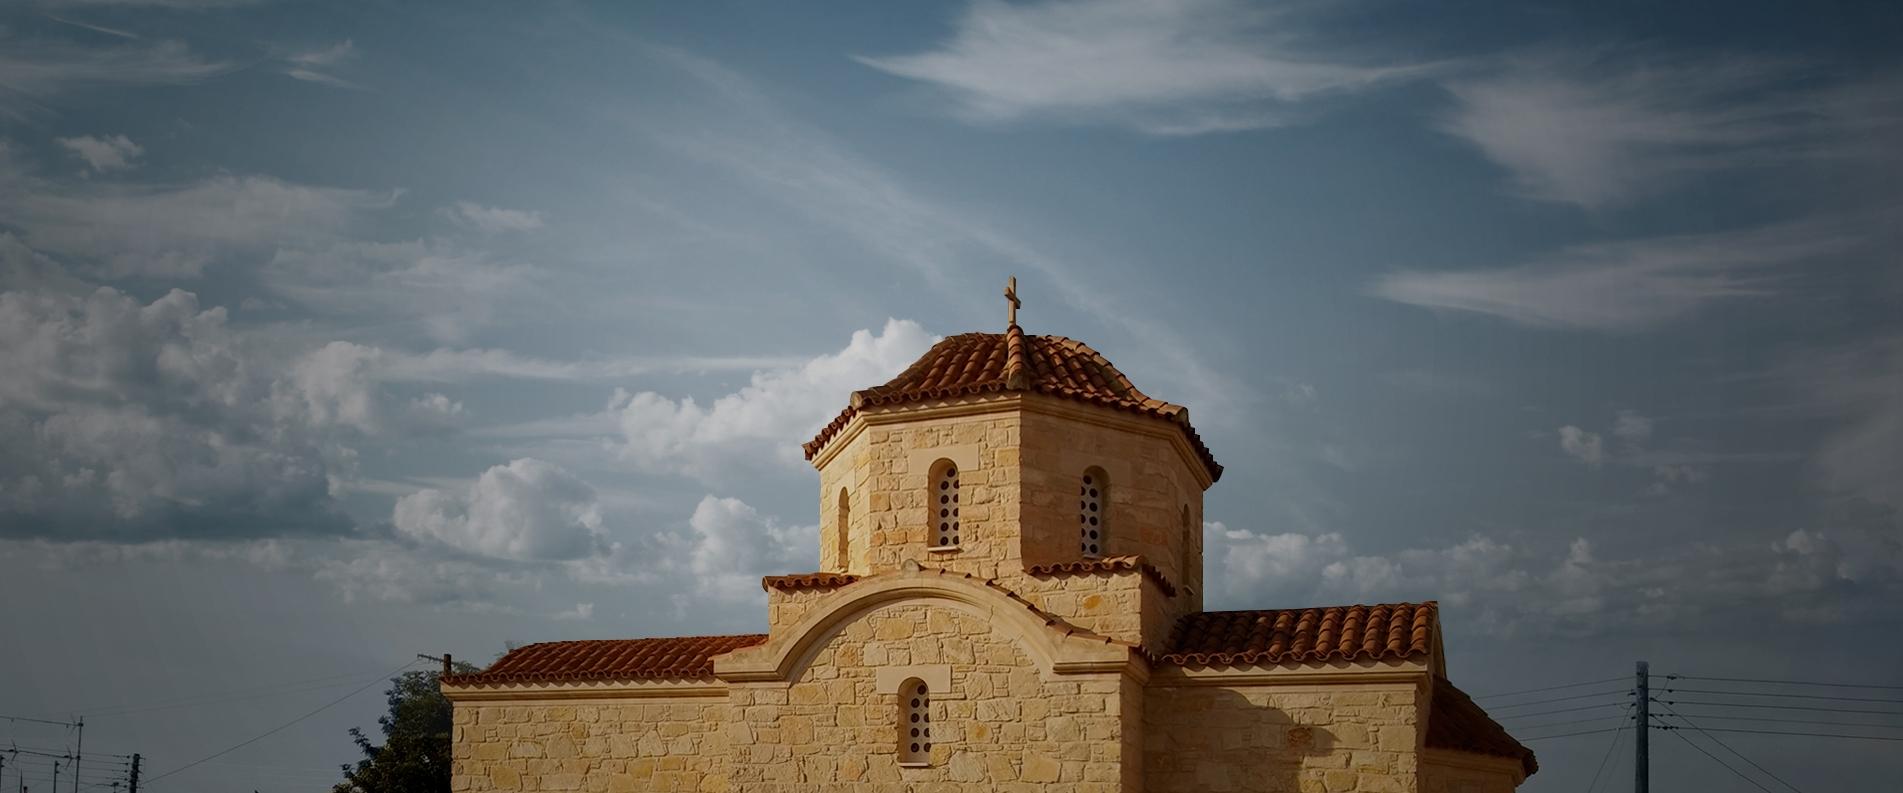 Где-то на полпути в Троодос: Акаки и Перистерона